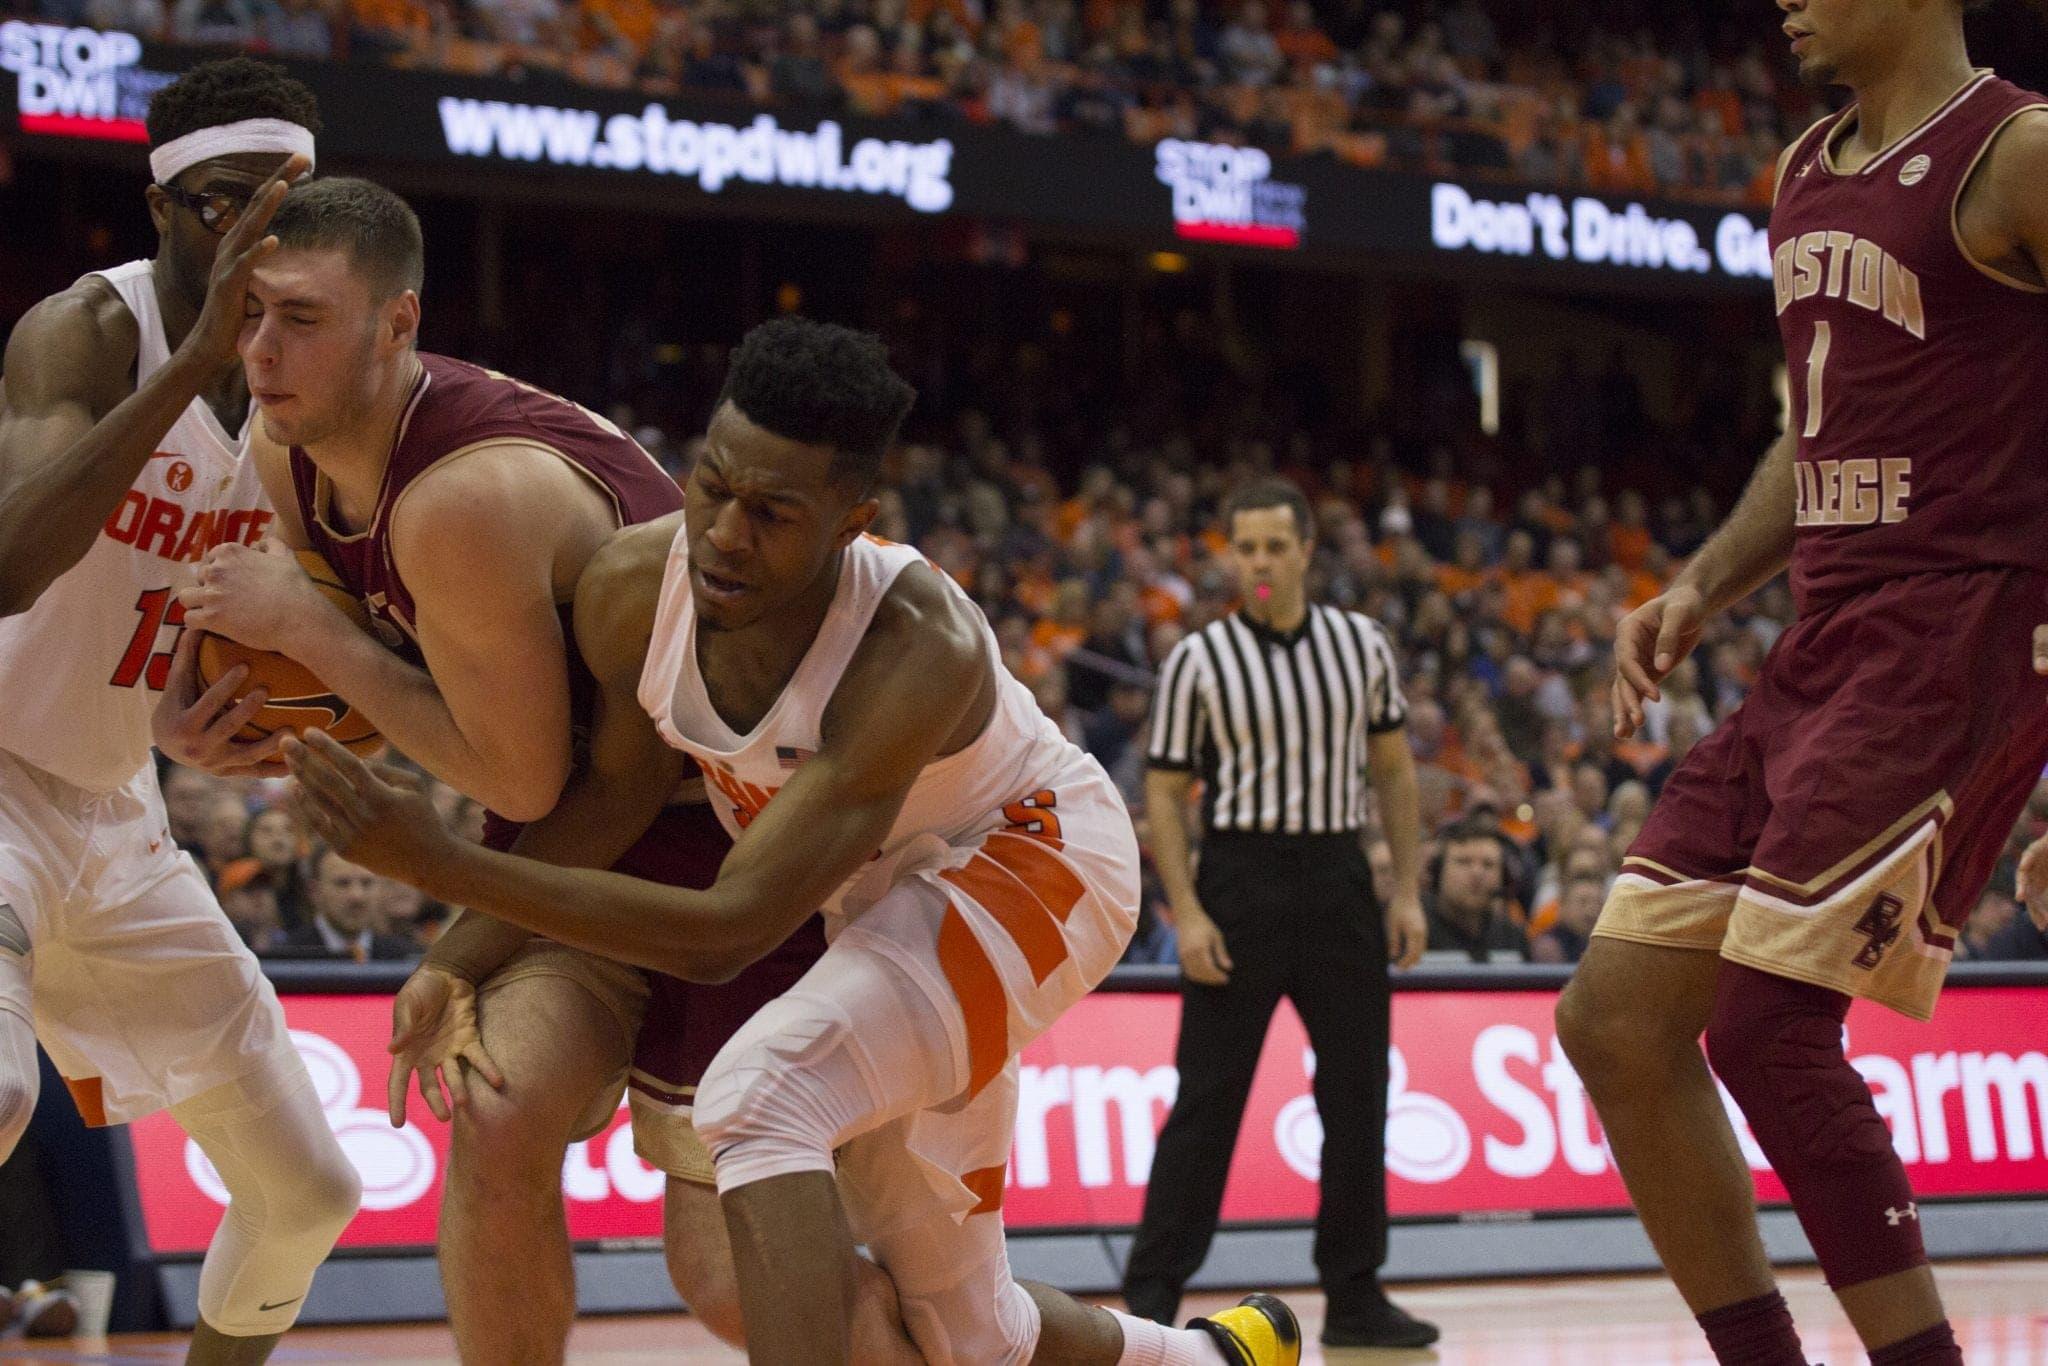 Men's basketball versus Boston College